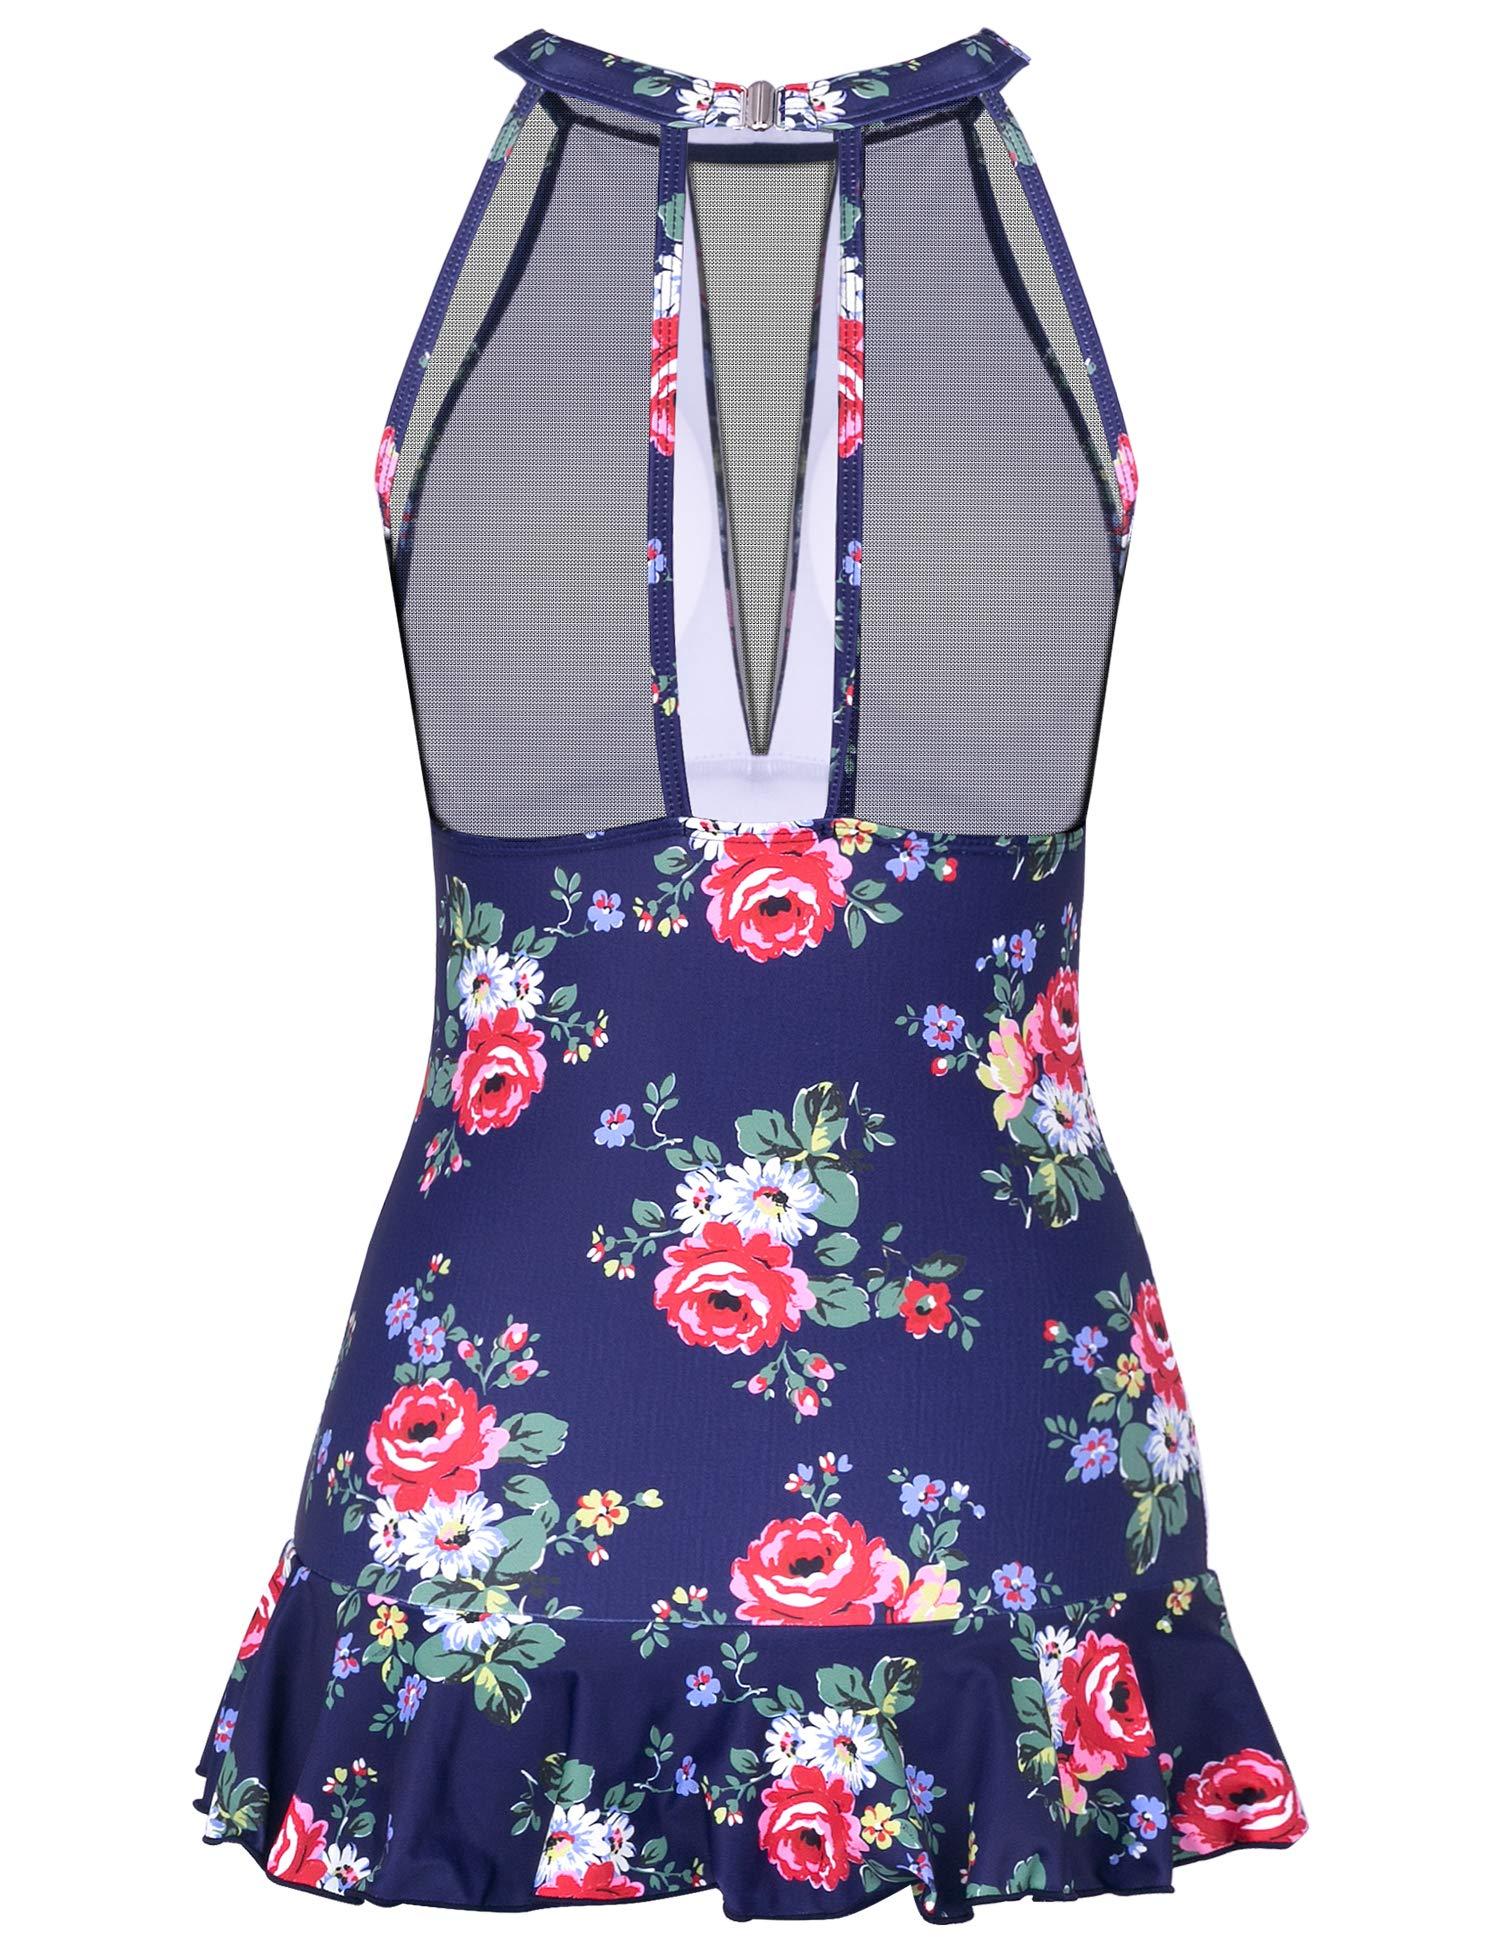 MarinaVida Women\'s One Piece Swimsuits V-Neck Mesh Shaping Swimwear Ruched Monokini Tummy Control Skirted Bathing Suits